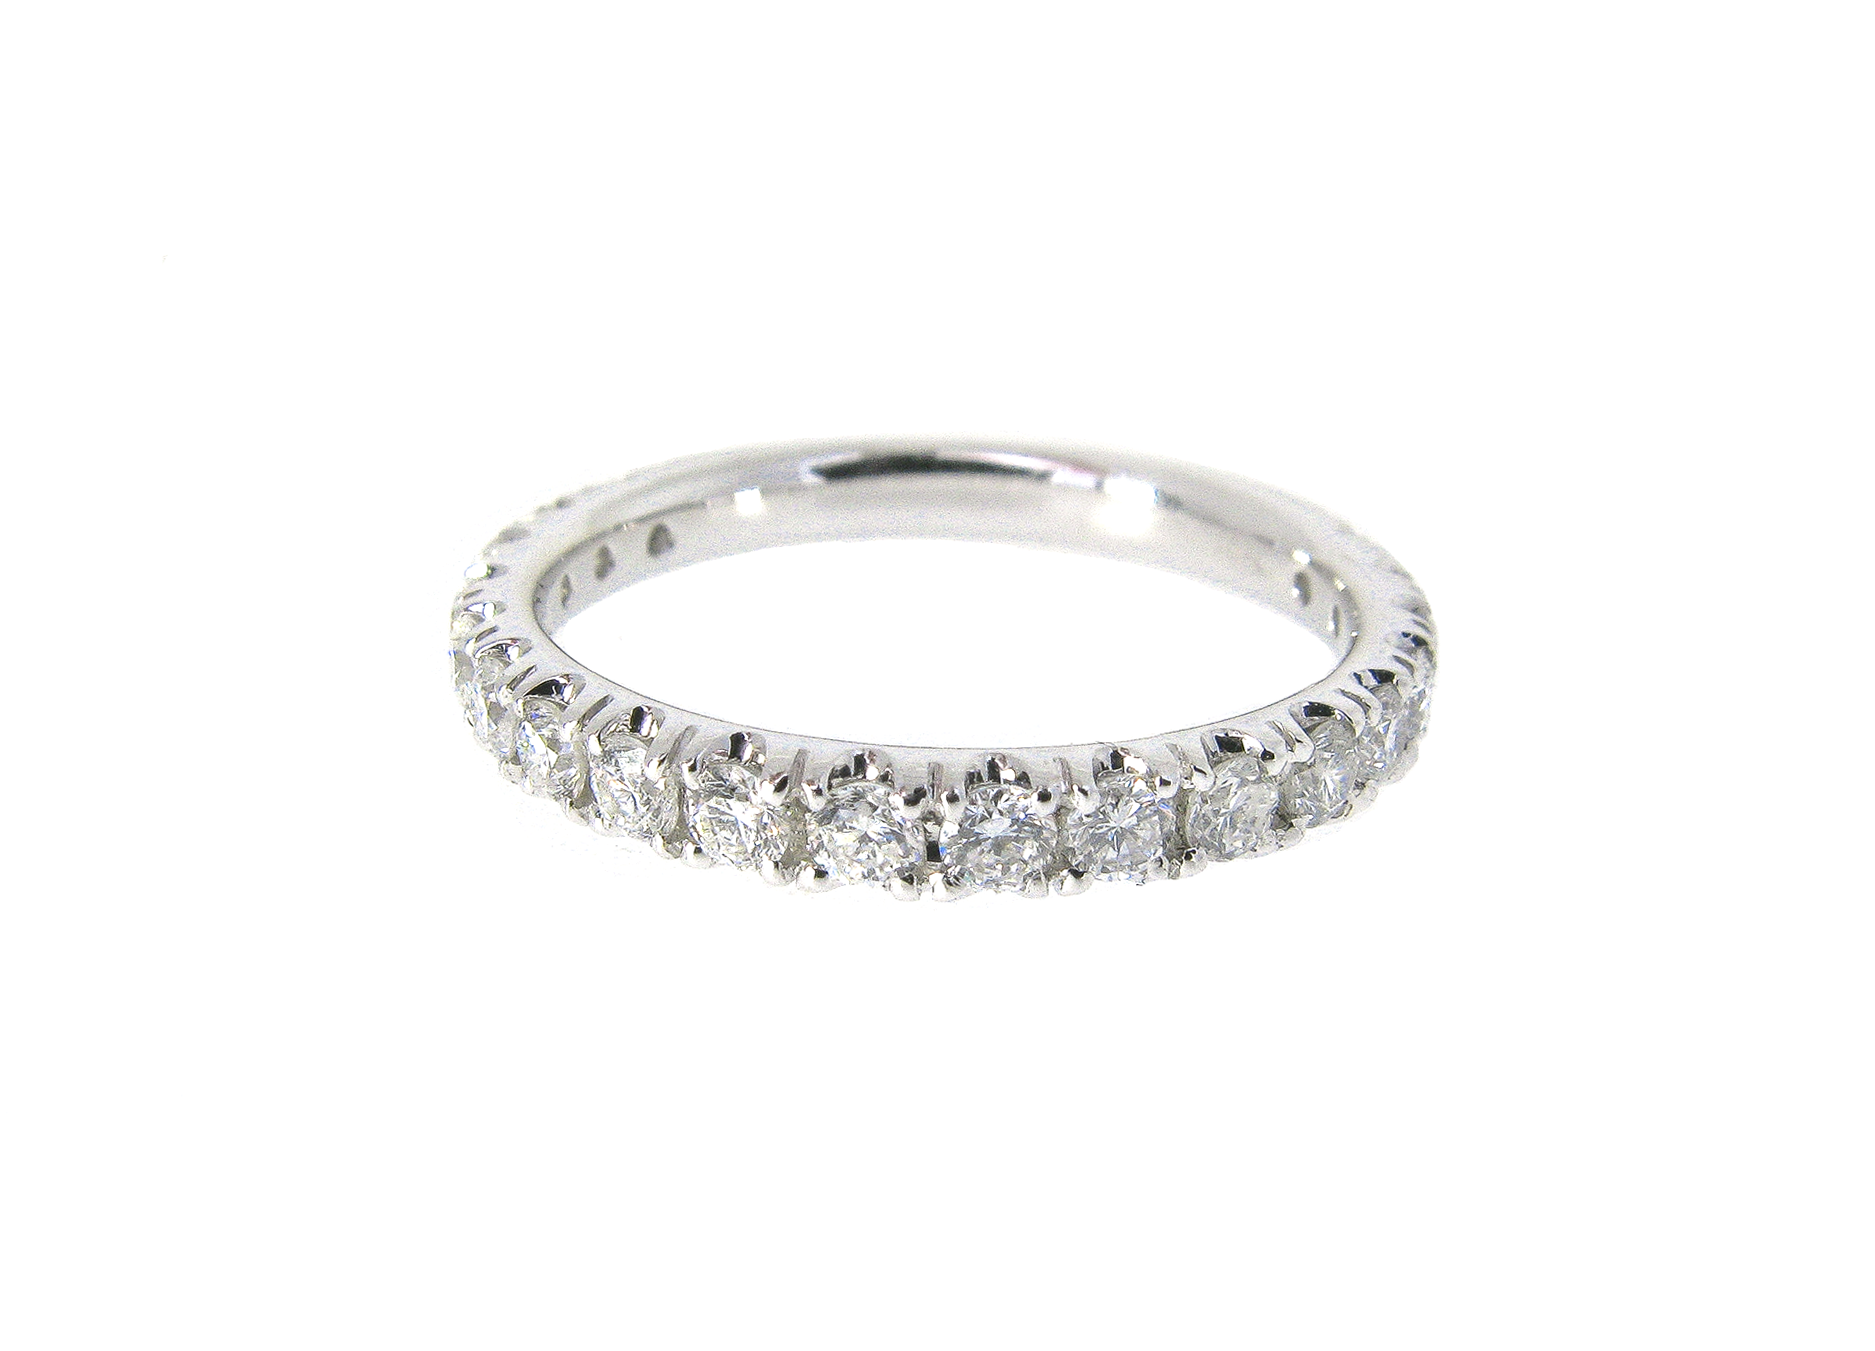 diamond wedding band | B20928.1